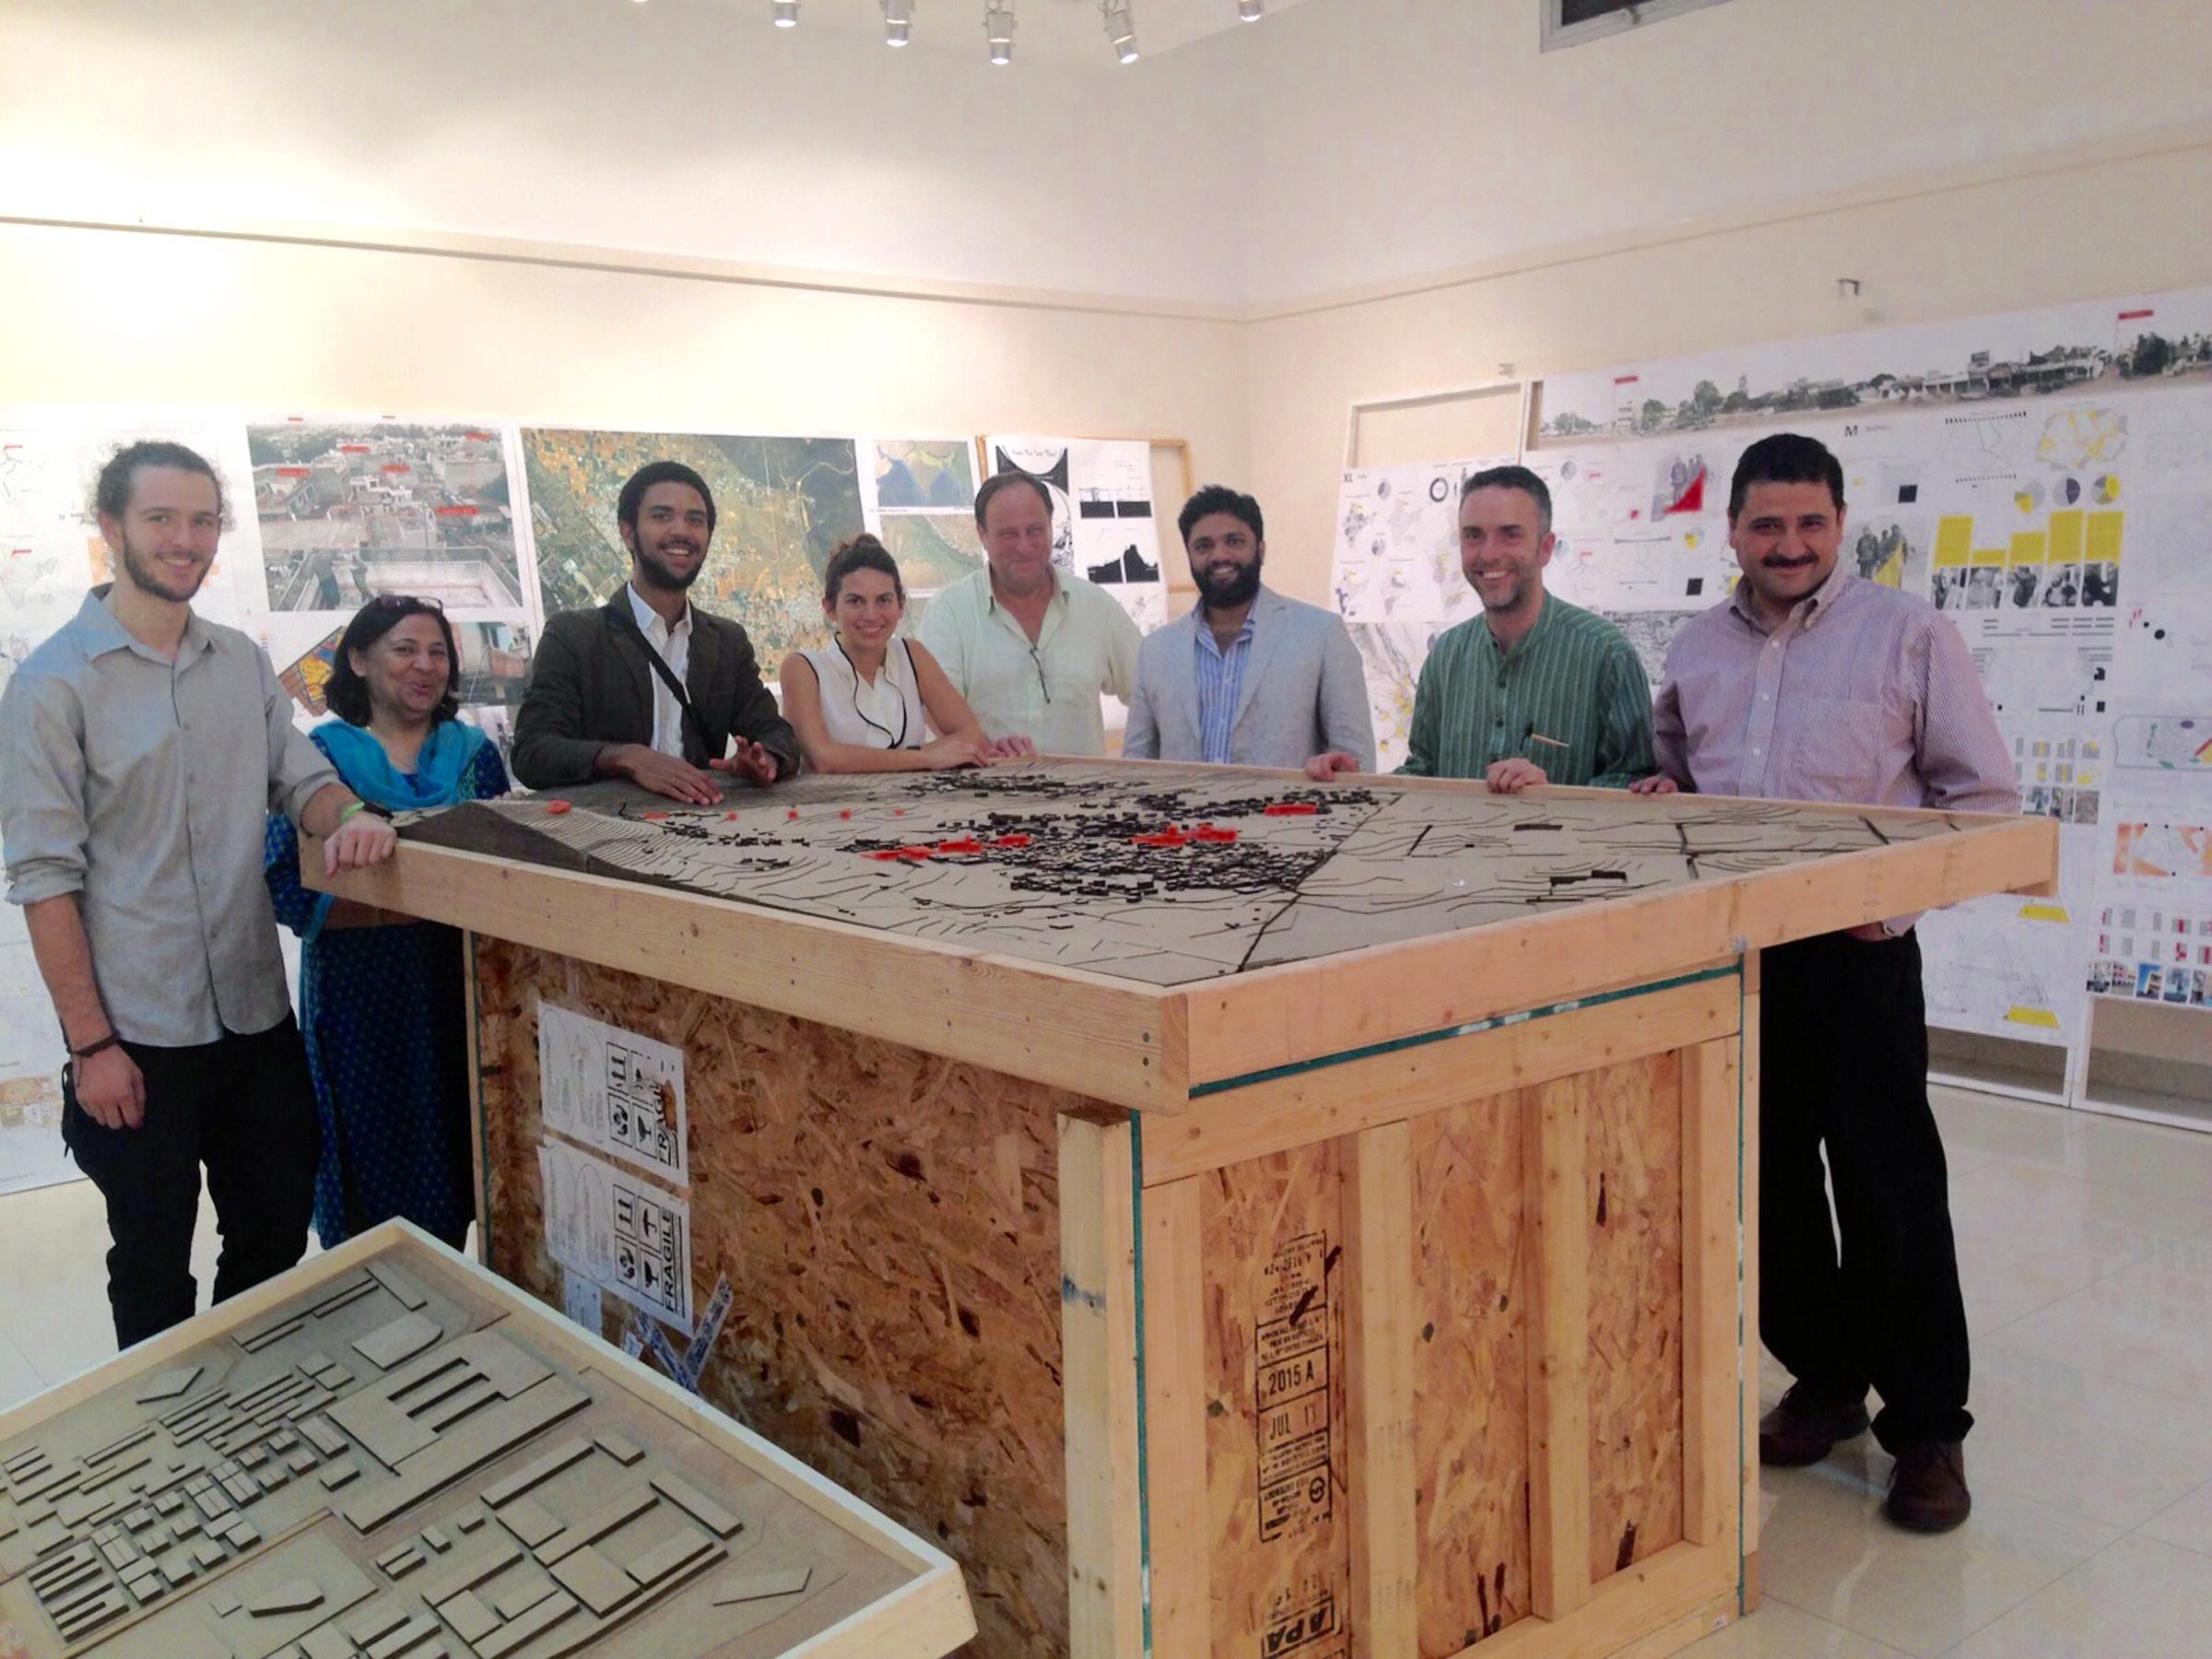 Urban Edge Chandigarh Exhibit 1 - 2015.jpg